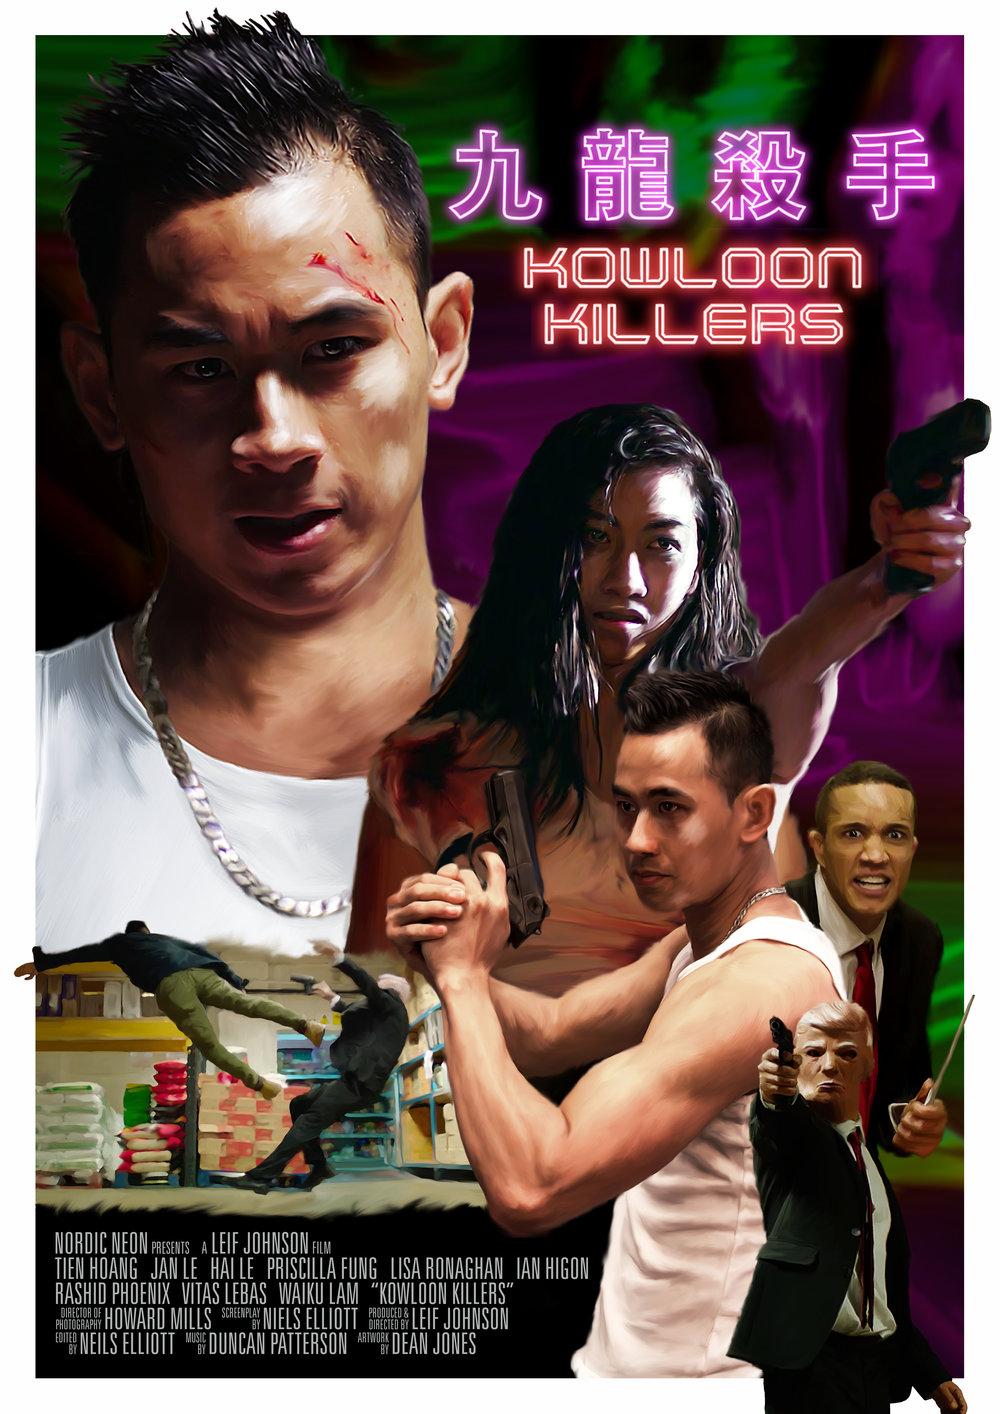 Kowloon_Killers_poster_final.jpg